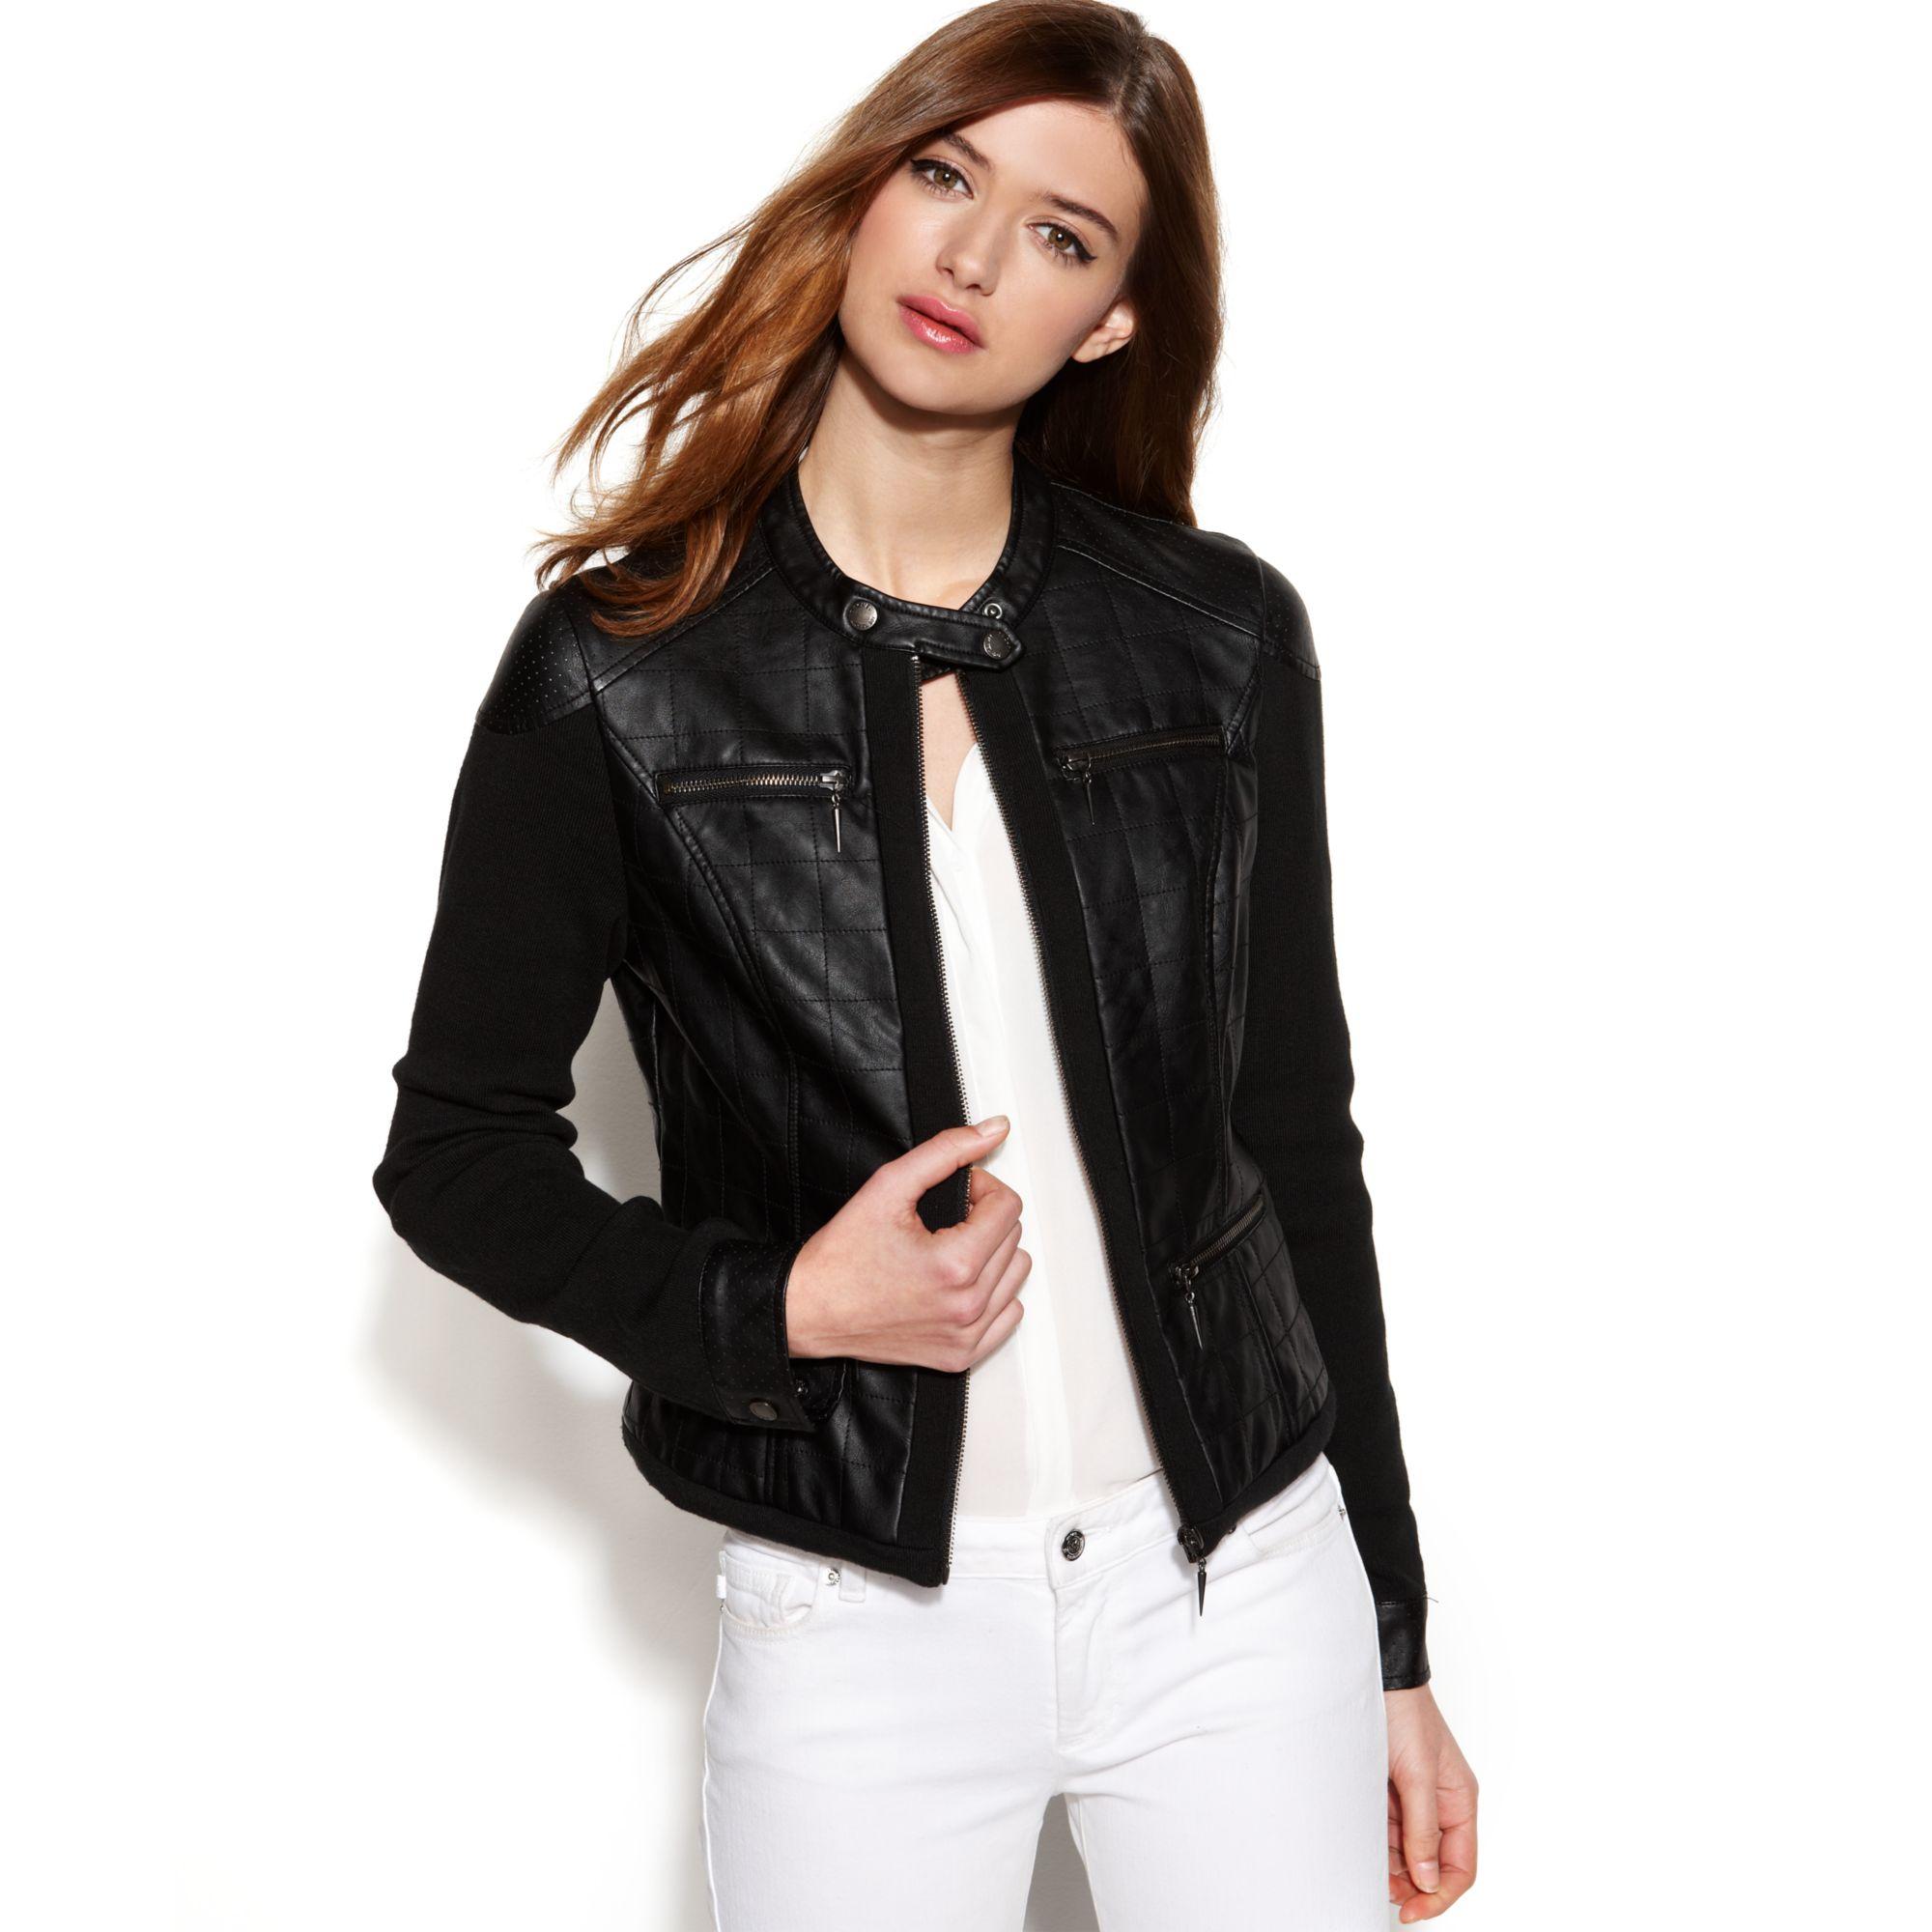 Juniors Faux Leather Jackets - Jacket